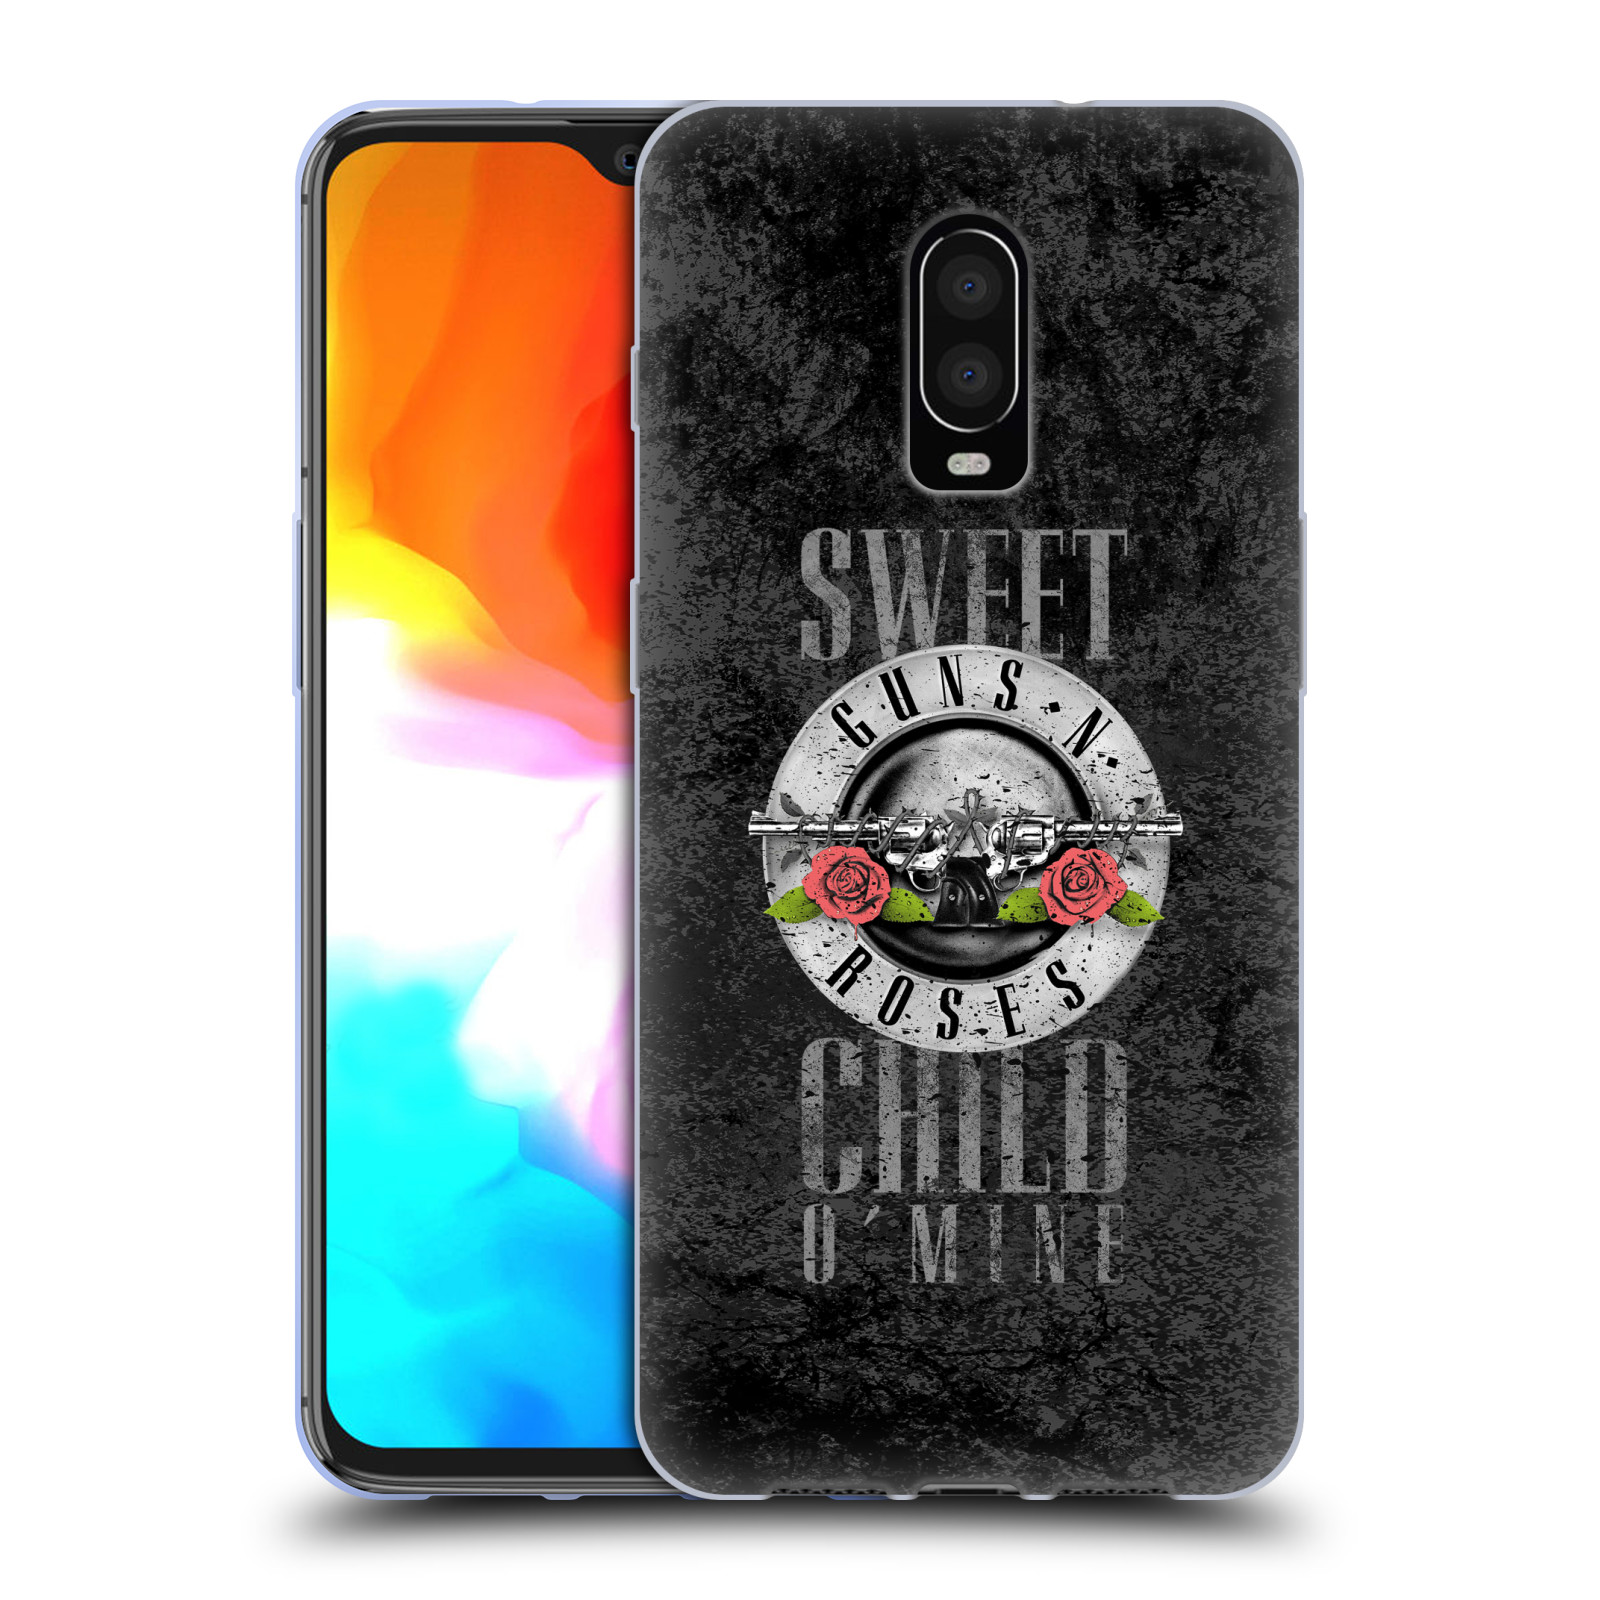 Silikonové pouzdro na mobil OnePlus 6T - Head Case - Guns N' Roses - Sweet Child